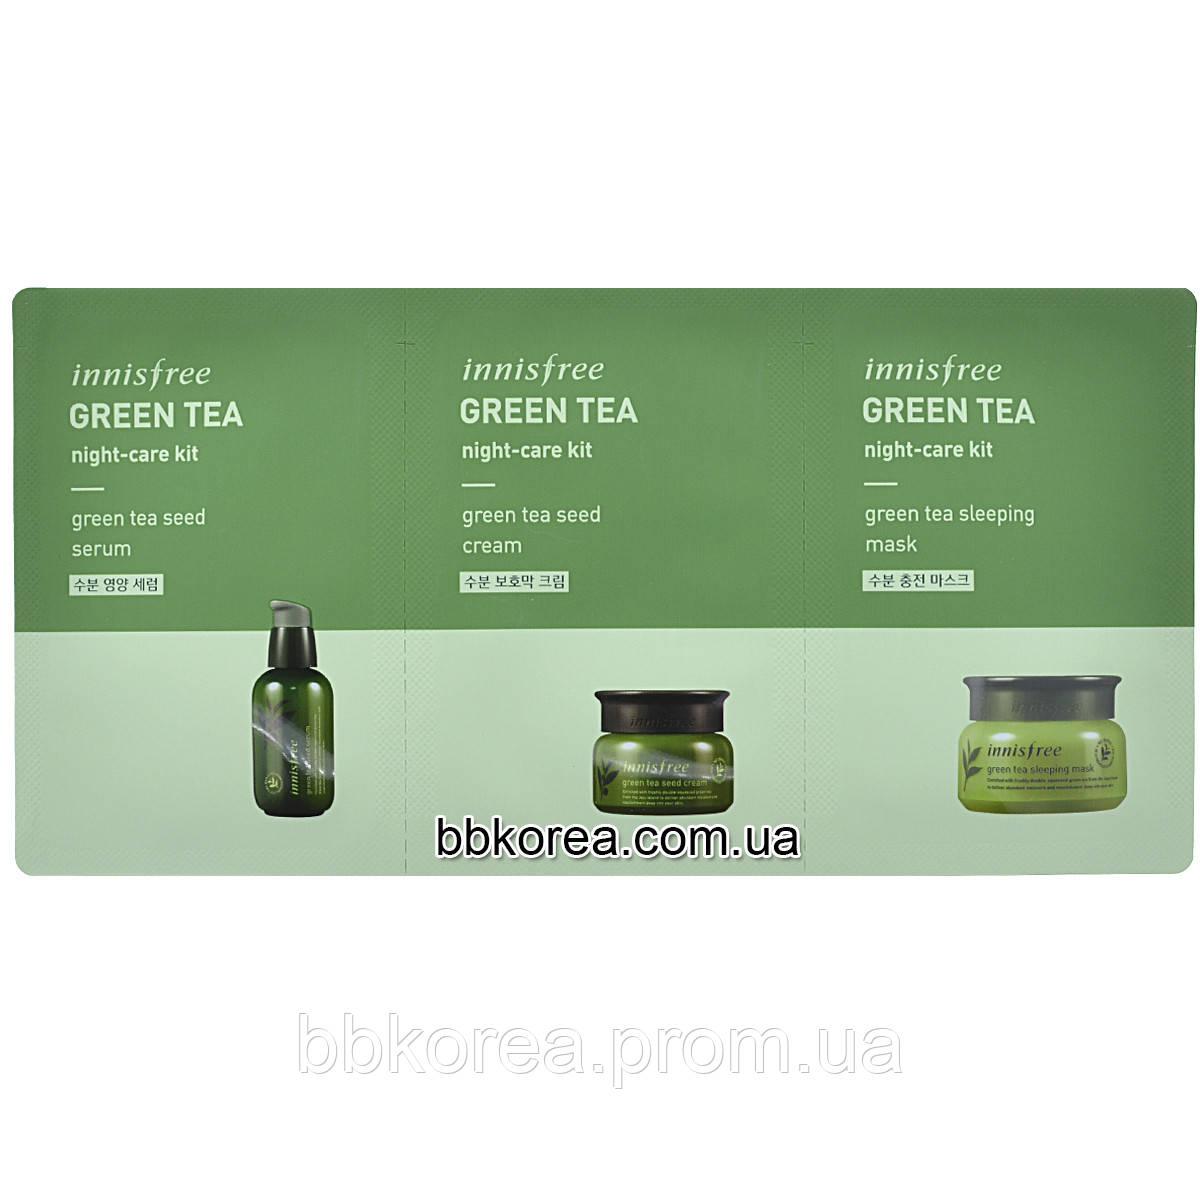 Innisfree Green Tea Night Care Kit 2291 Sleeping Pack Bbkorea